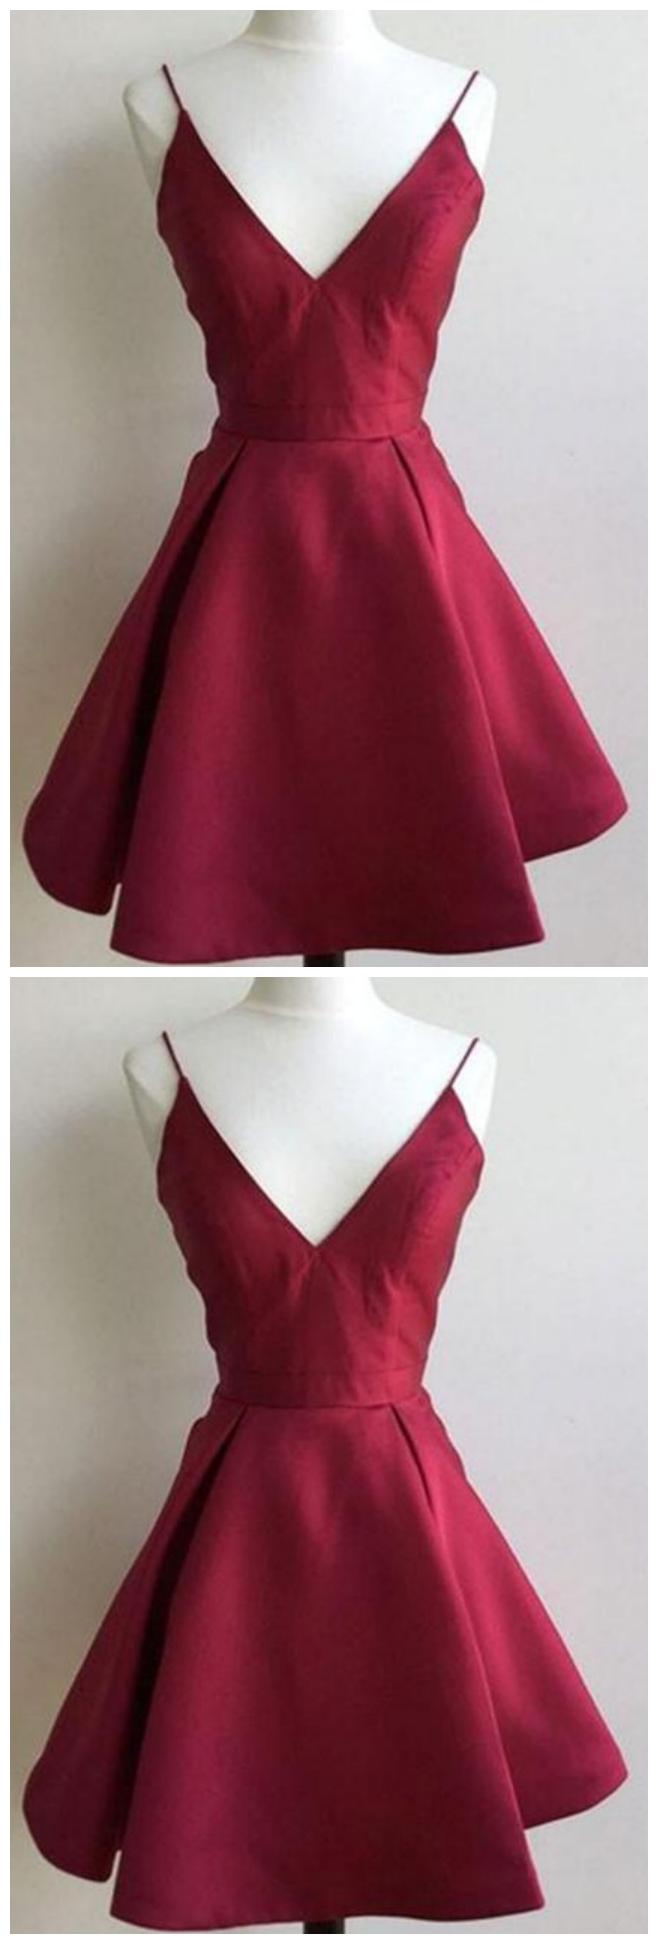 Burgundy V Neck Short Homecoming Dresses Sleeveless A Line Cocktail Dresses